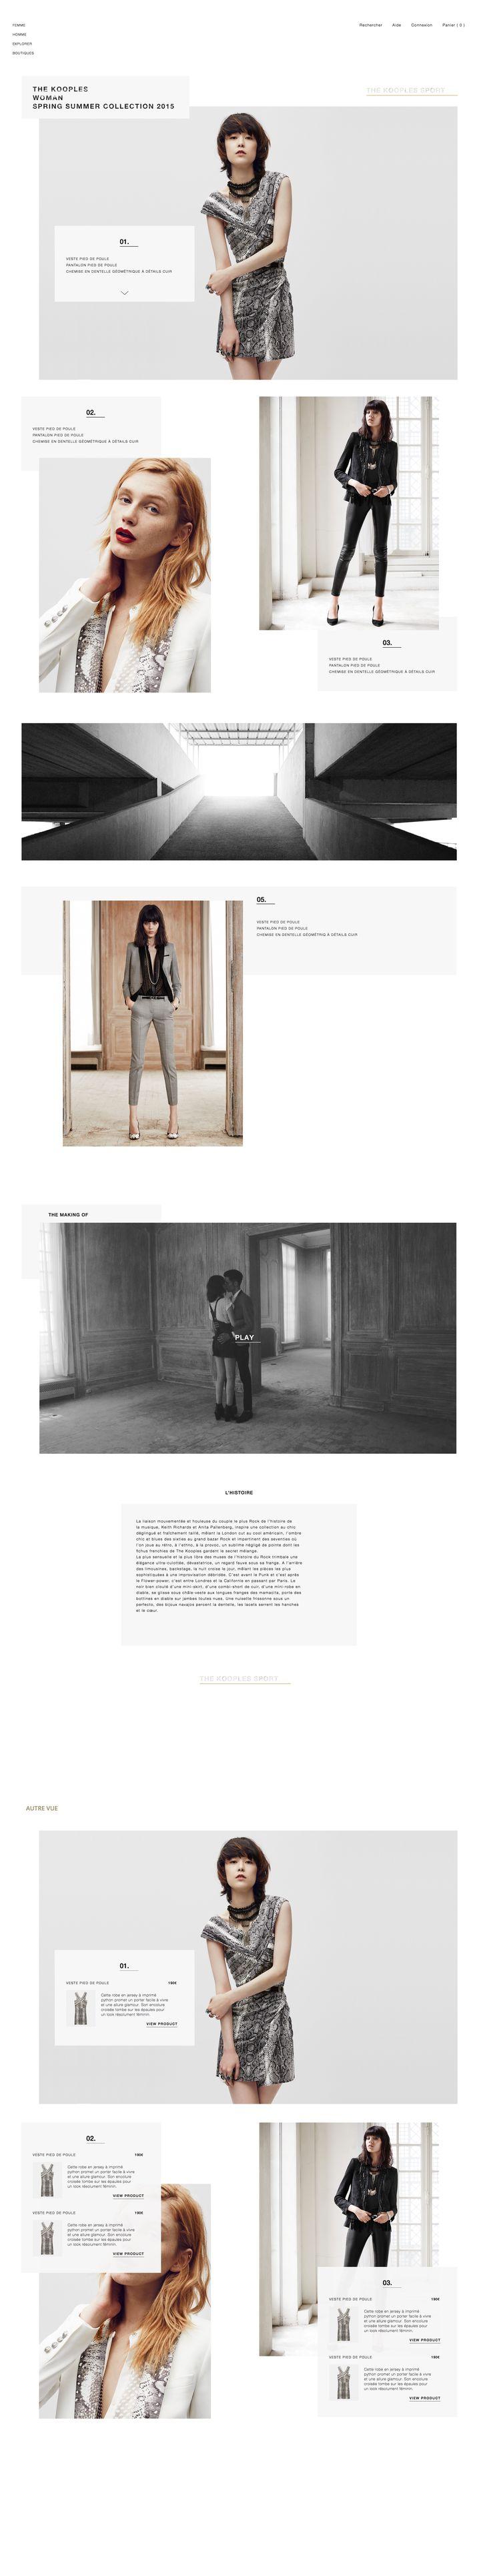 LOOKBOOK - The Kooples (Redesign) by Pierre Sudre